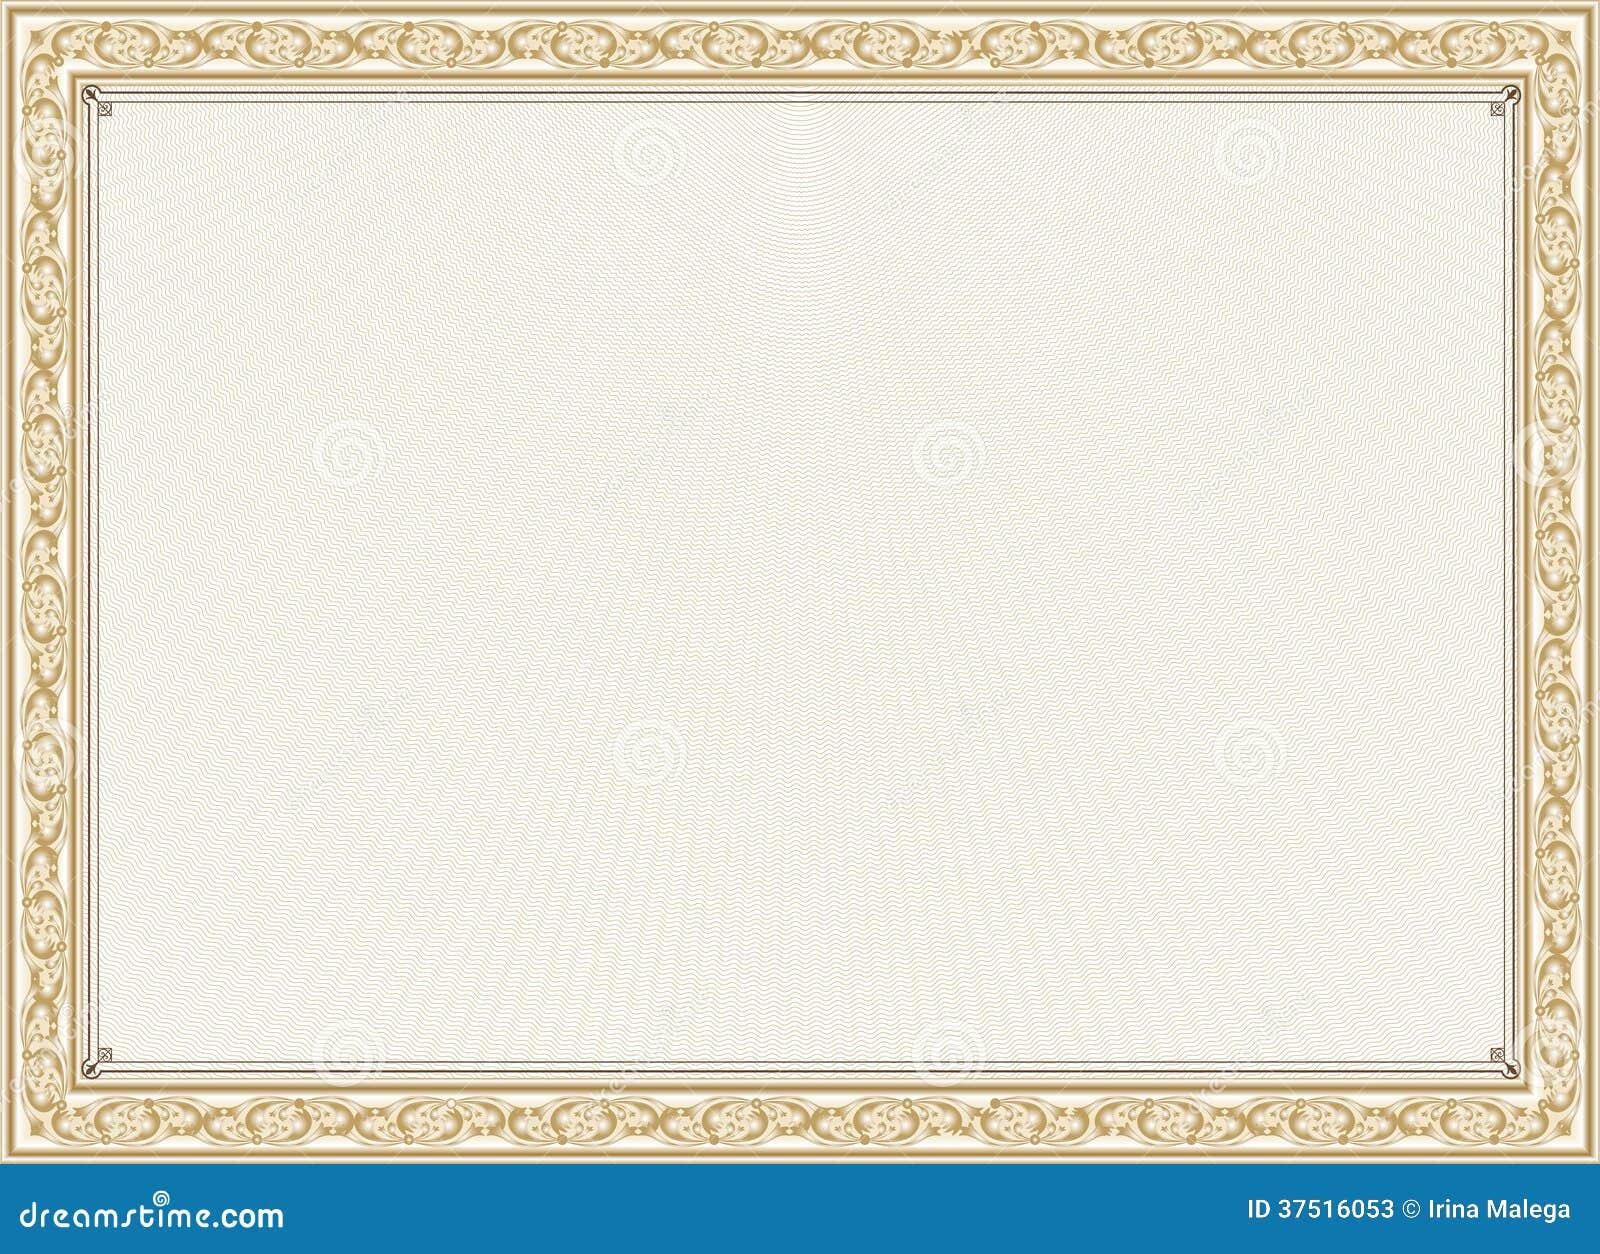 Certificate Frame 8  5